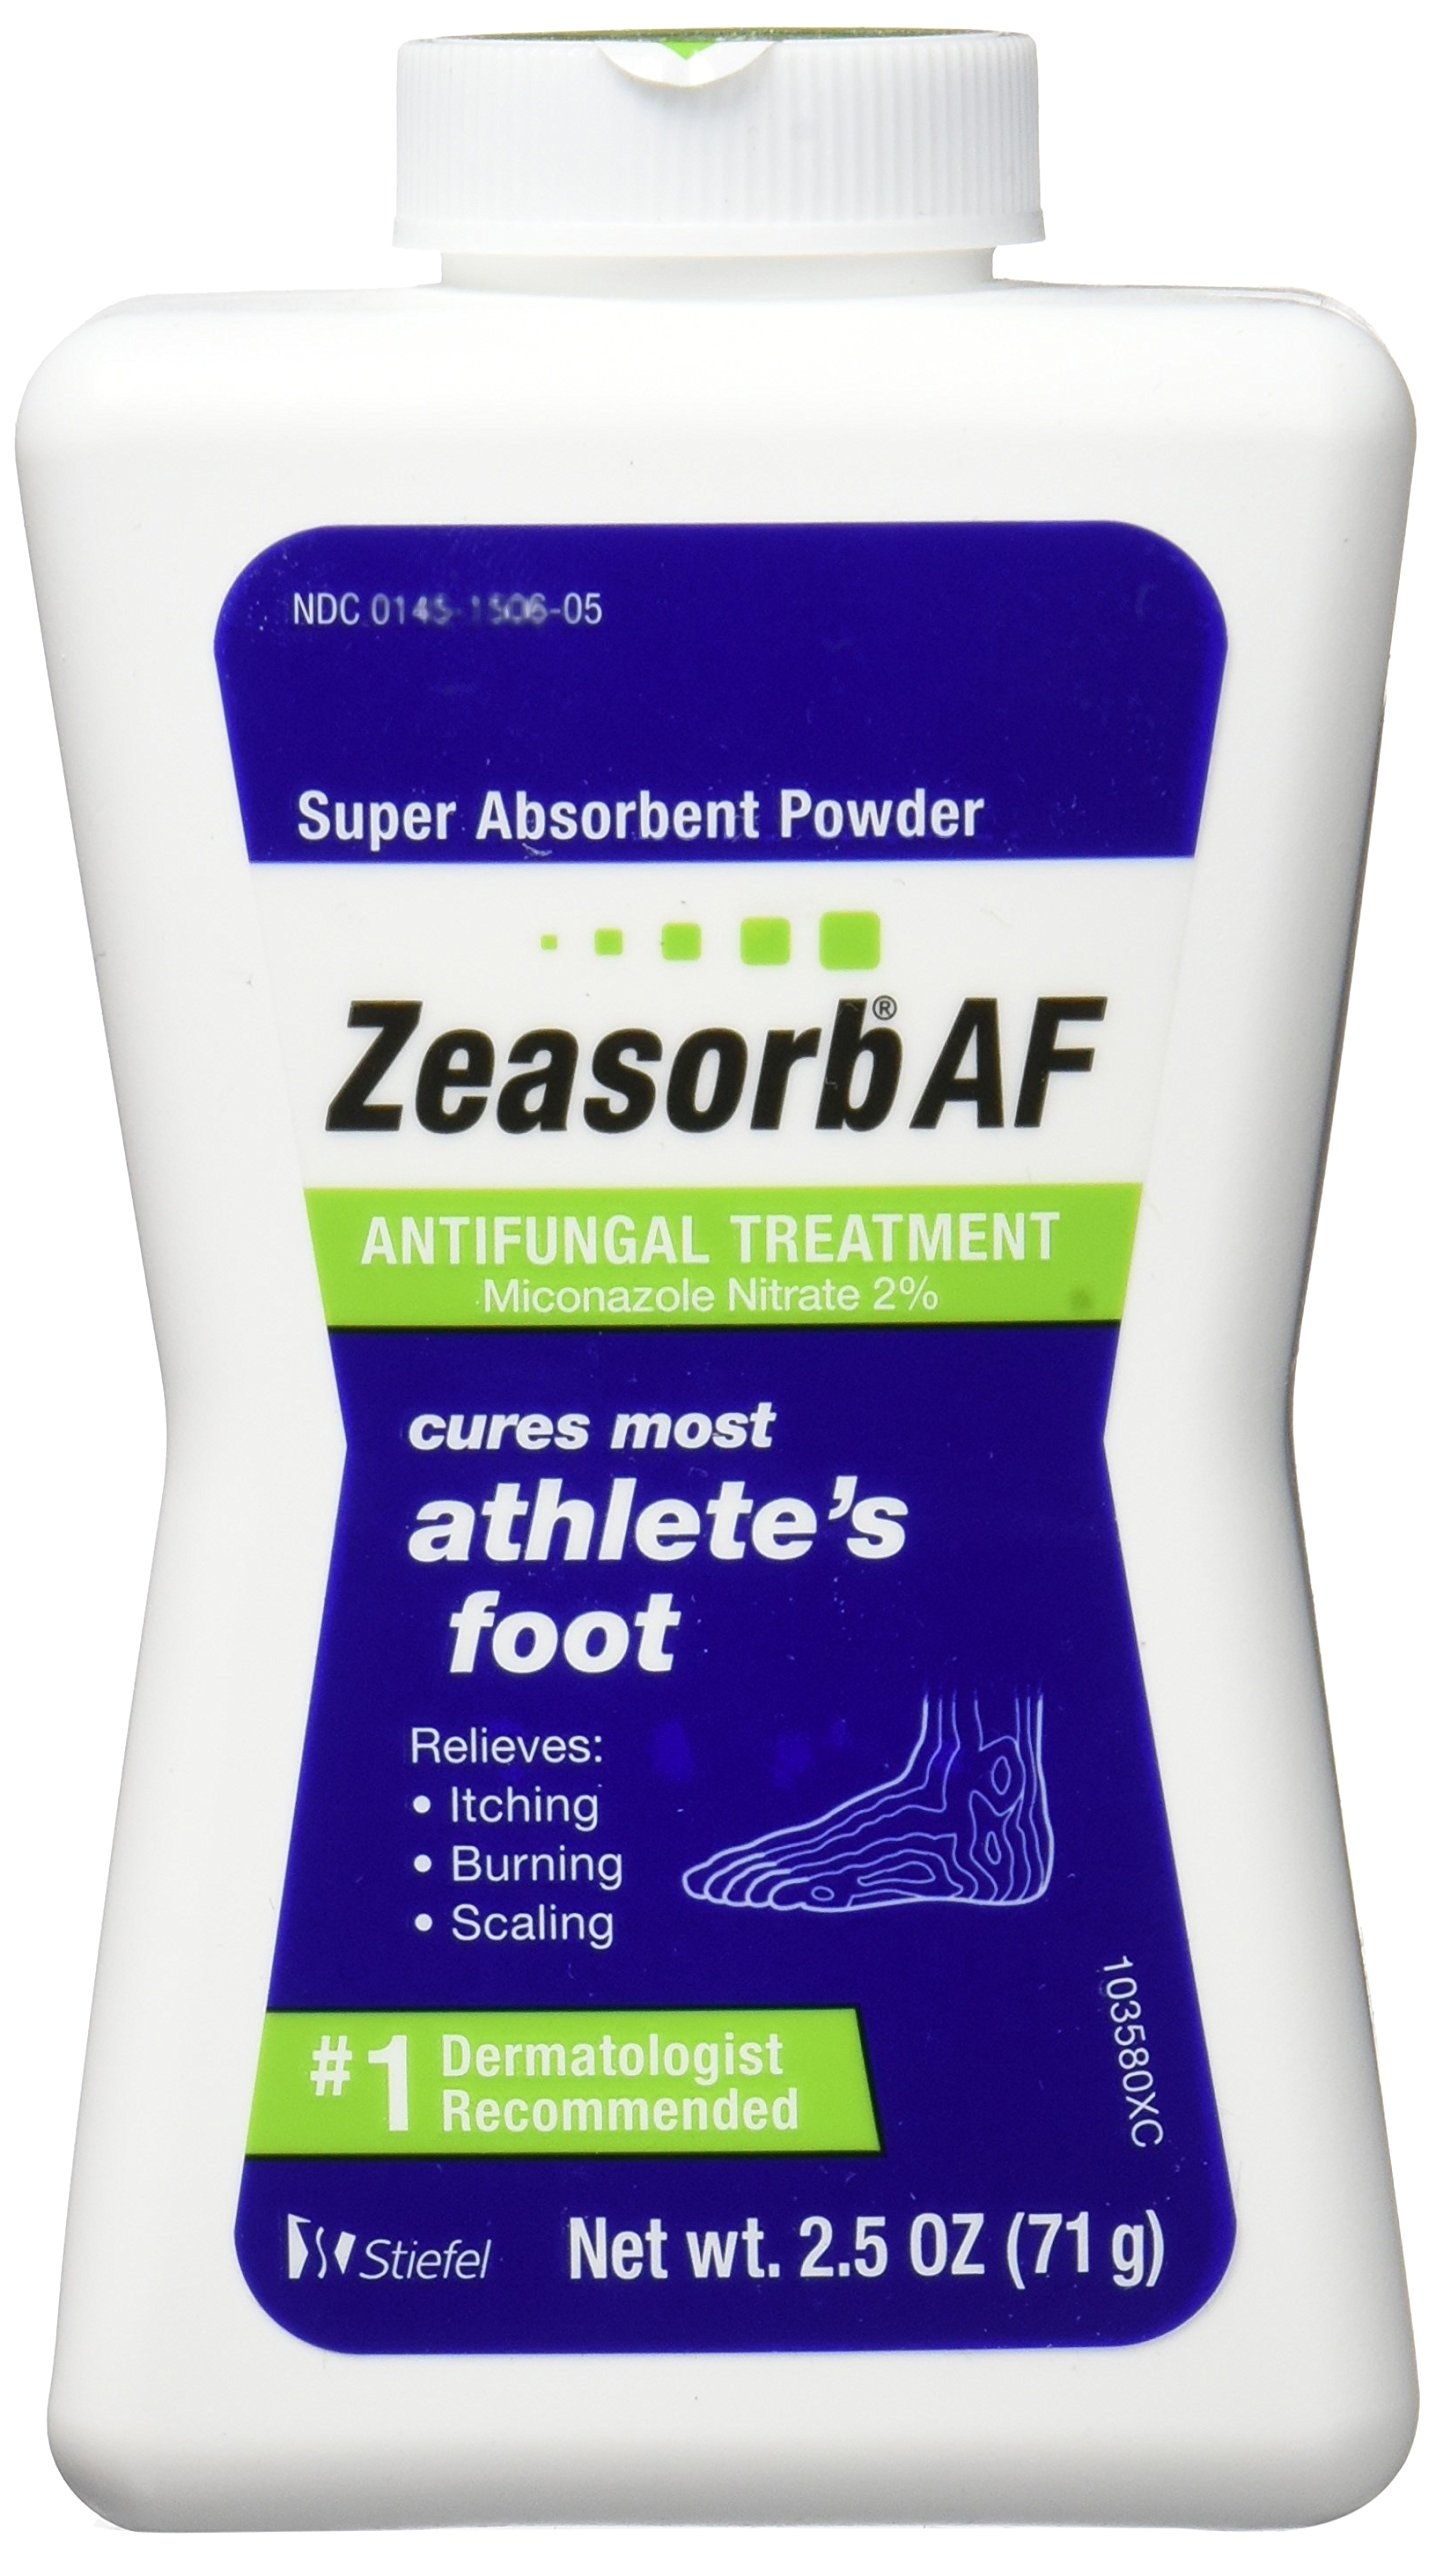 Zeasorb Antifungal Powder Treatment For Athletes Foot - 2.5 Oz (3 Pack)